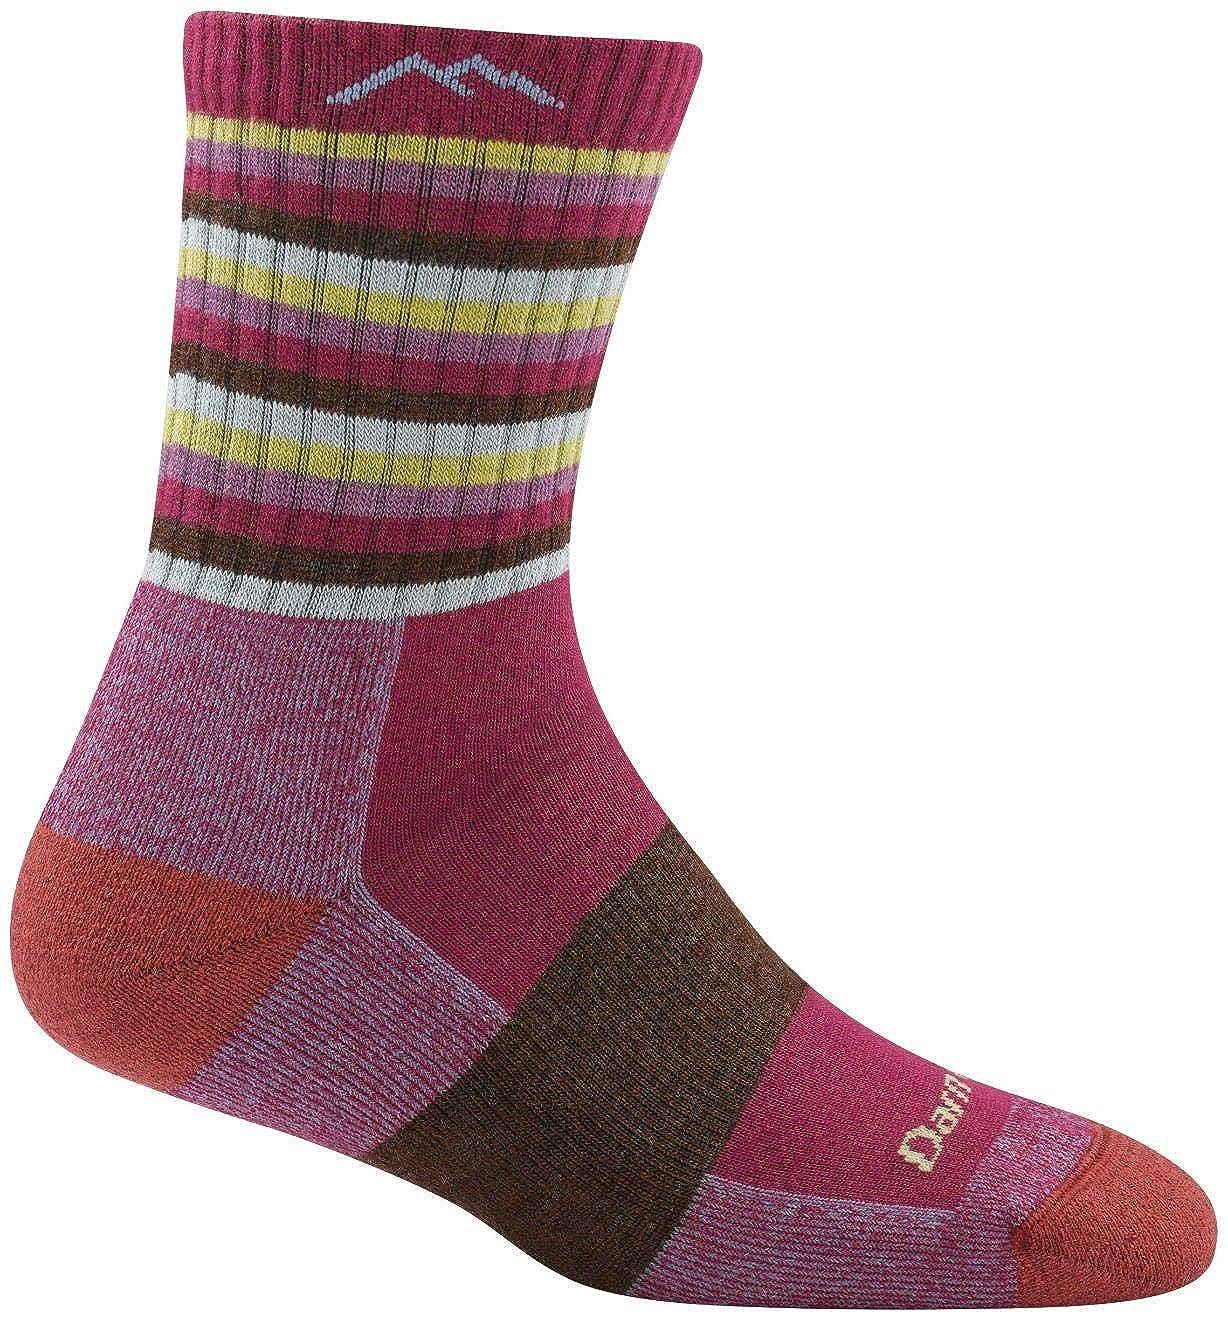 a4fe9004752 Amazon.com   Darn Tough Vermont Women s Merino Wool Micro Crew Cushion Socks    Athletic Socks   Clothing